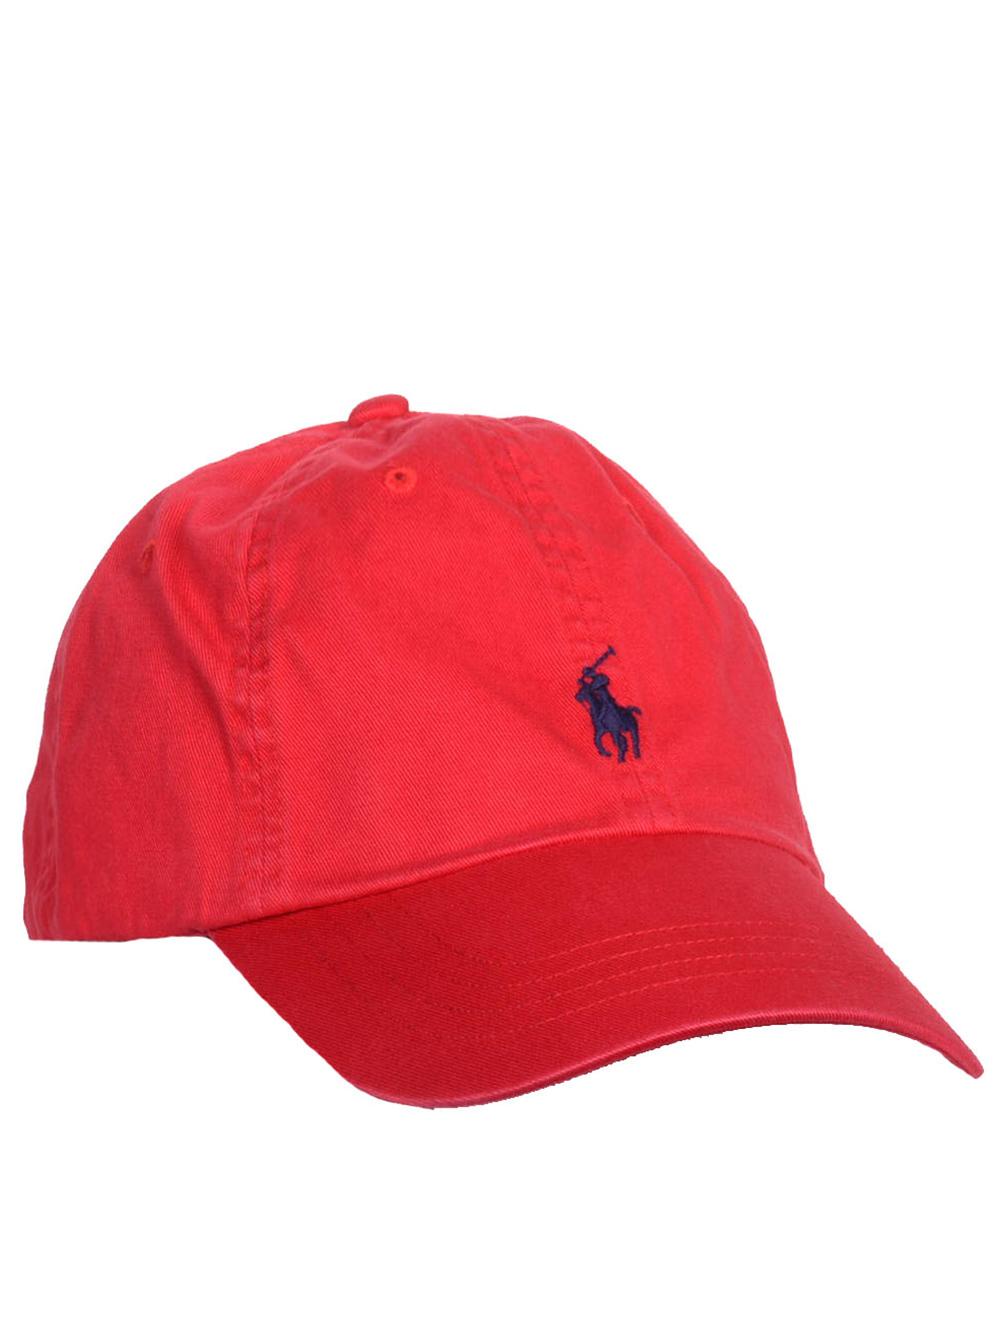 POLO RALPH LAUREN Καπέλο jockey 710548524002 ΚΟΚΚΙΝΟ